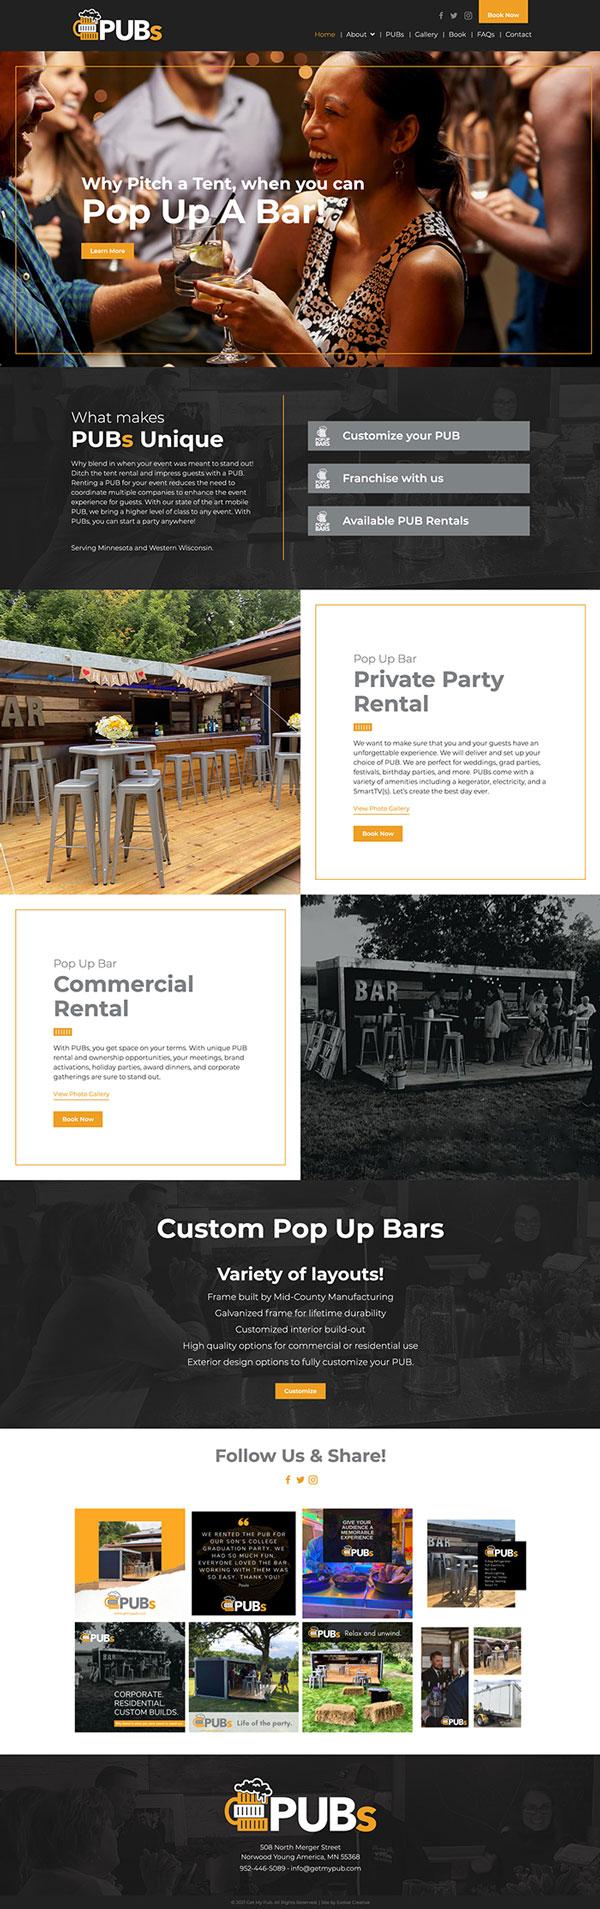 PUBS website design